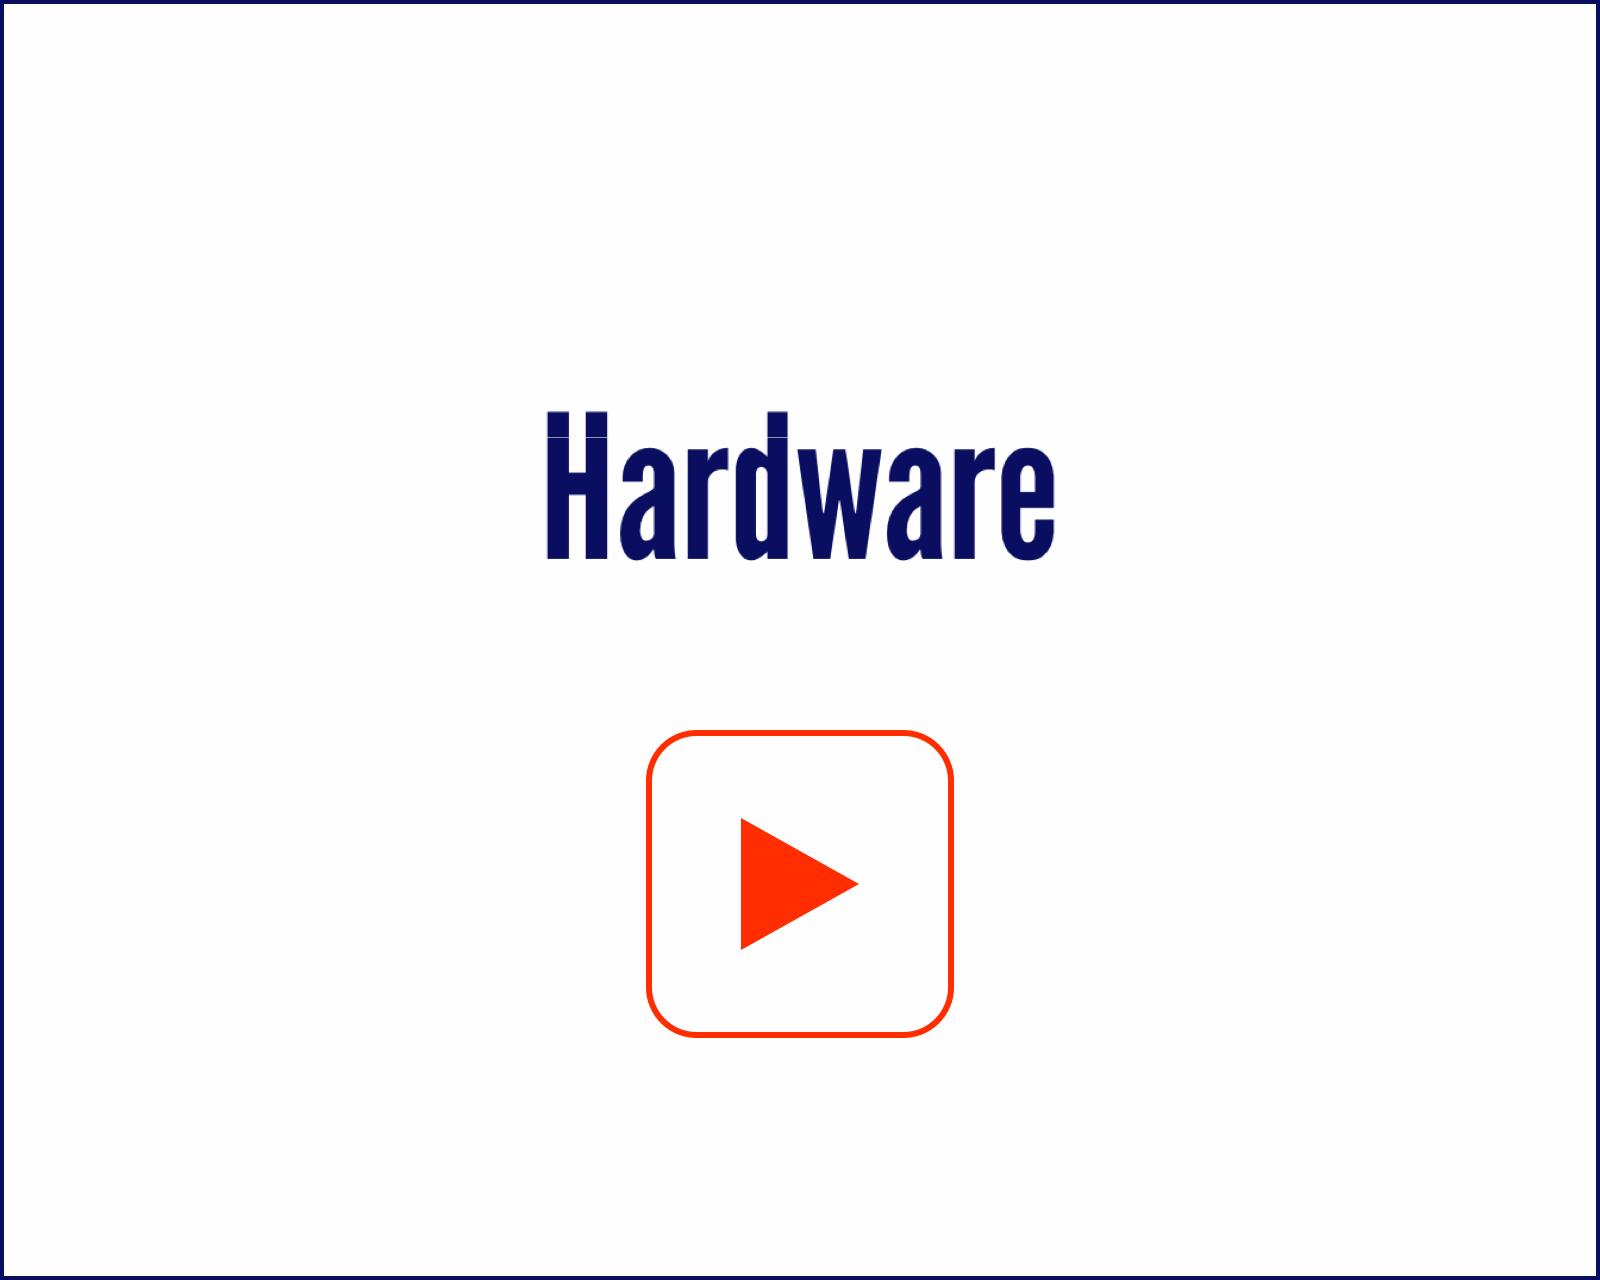 Hardware